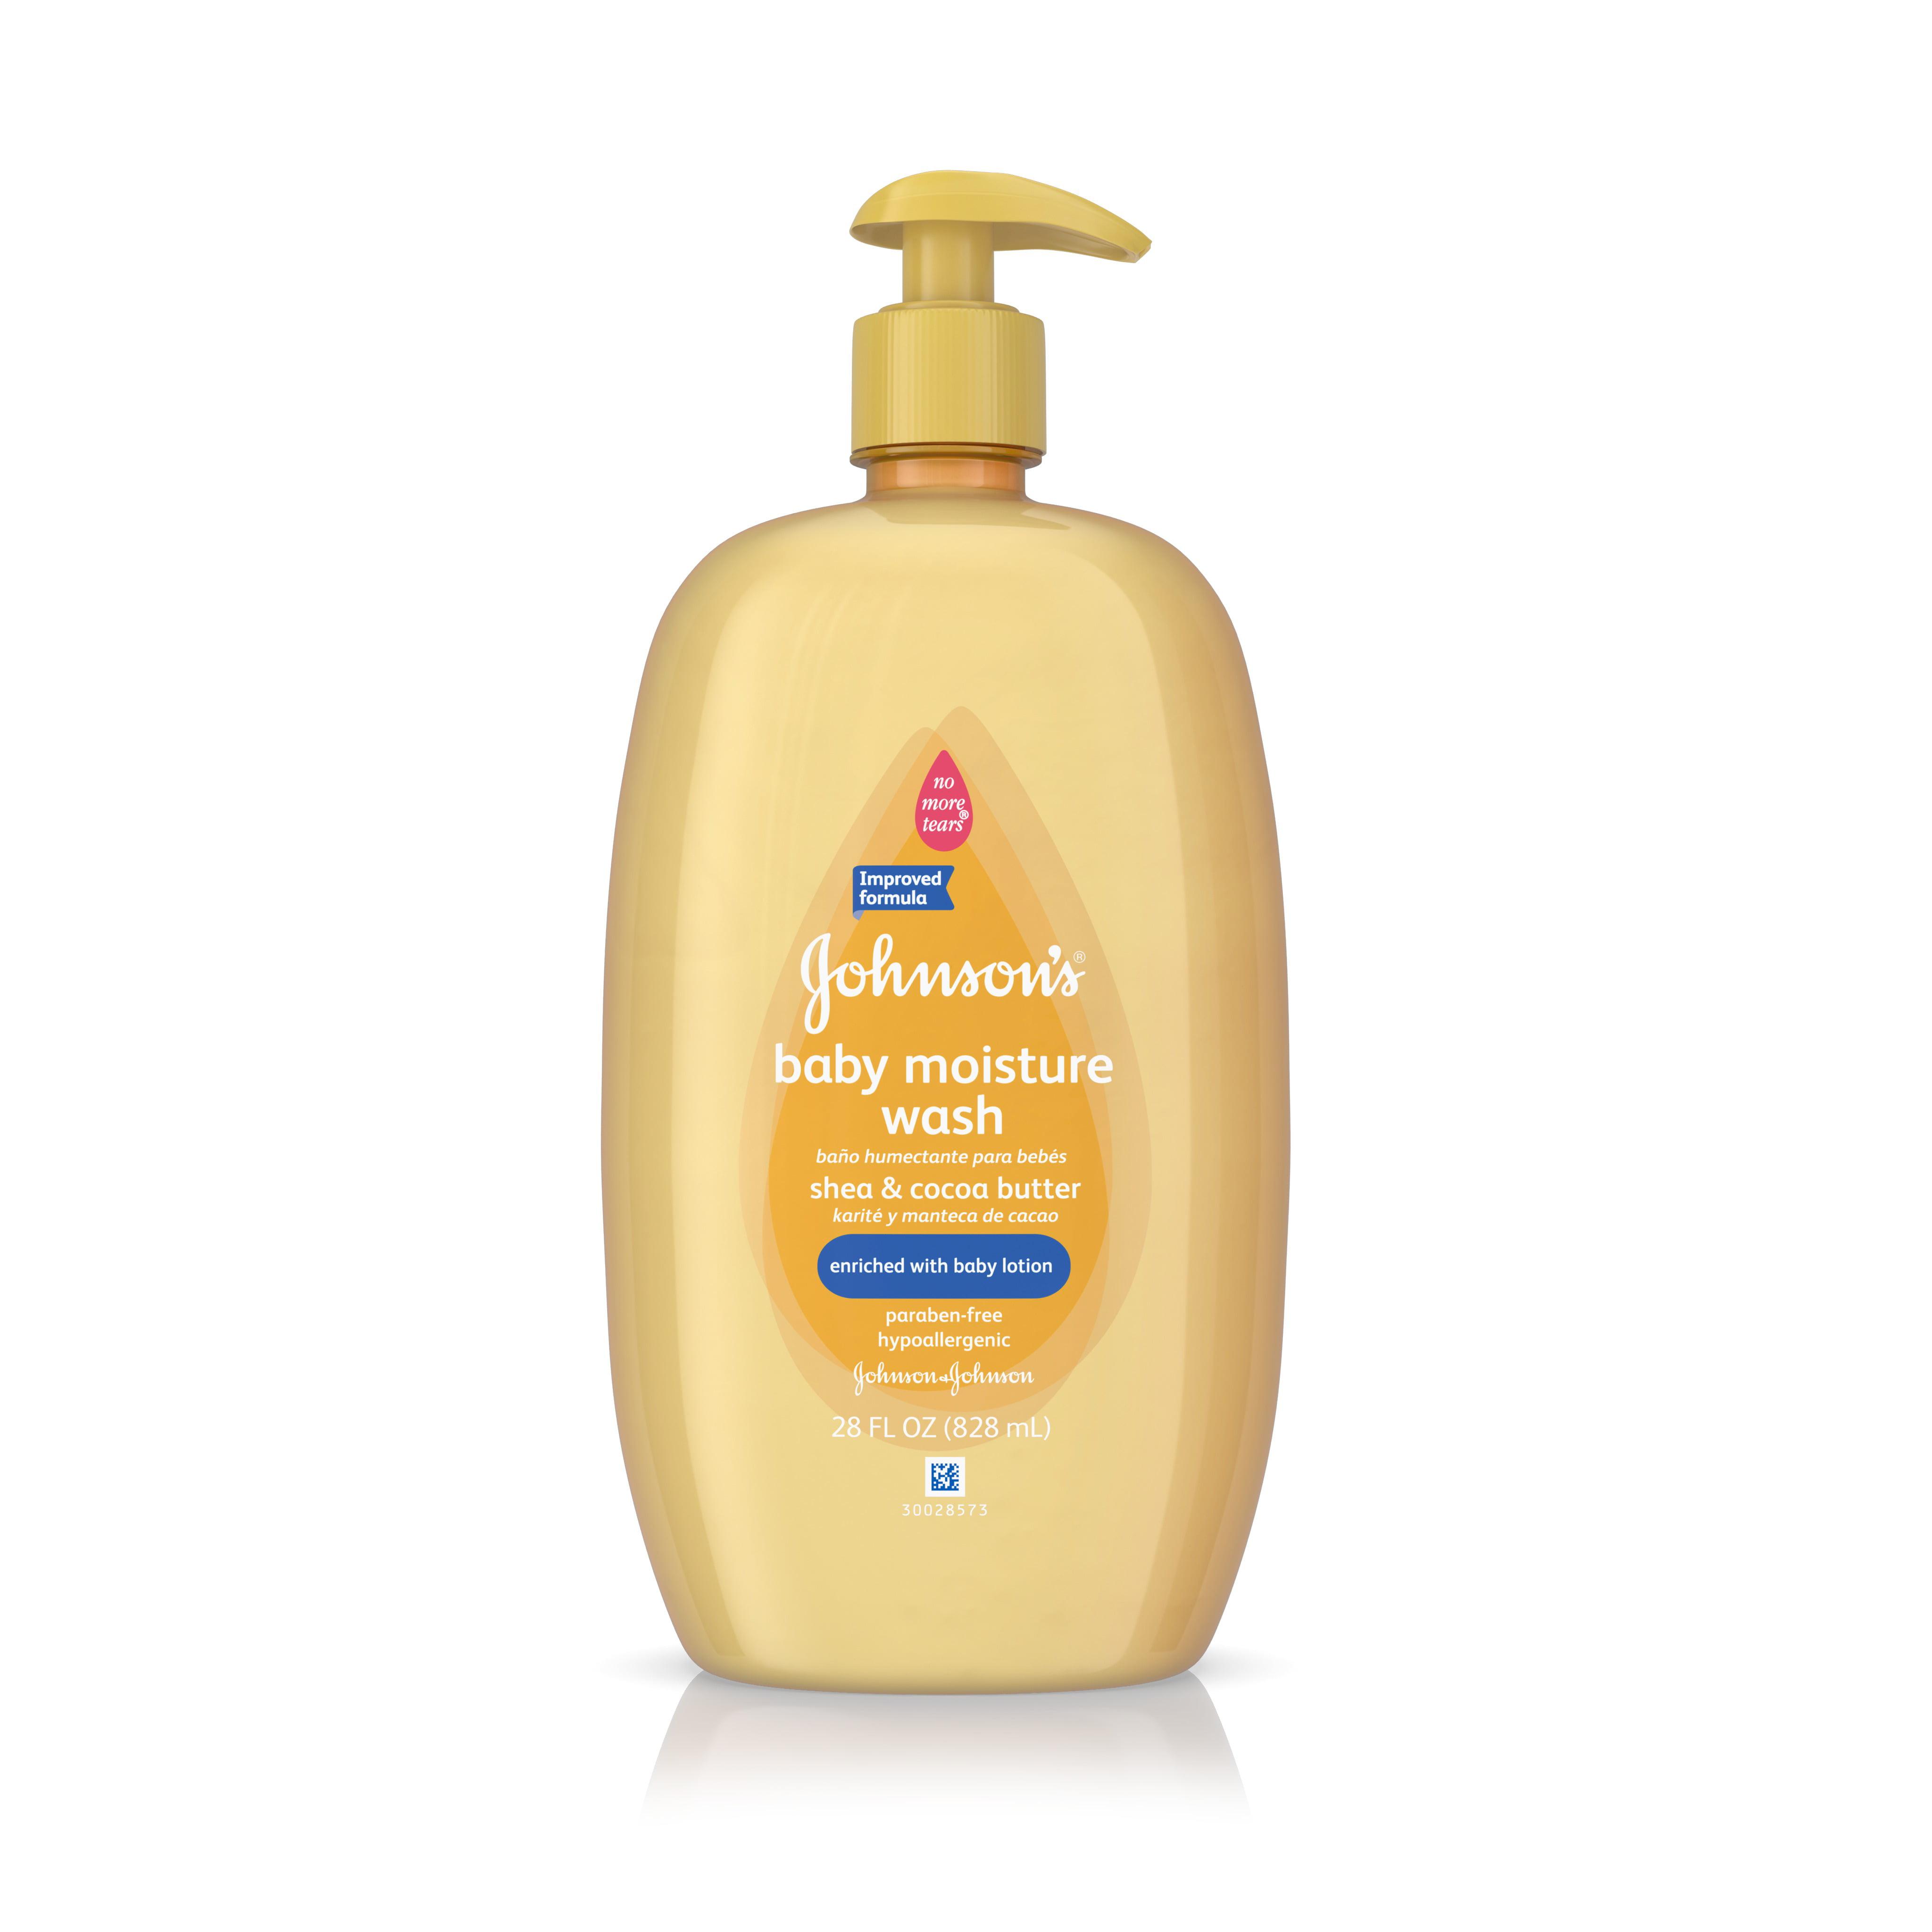 Johnson's Baby Shea & Cocoa Butter Moisture Wash For Dry Skin, 28 Oz.